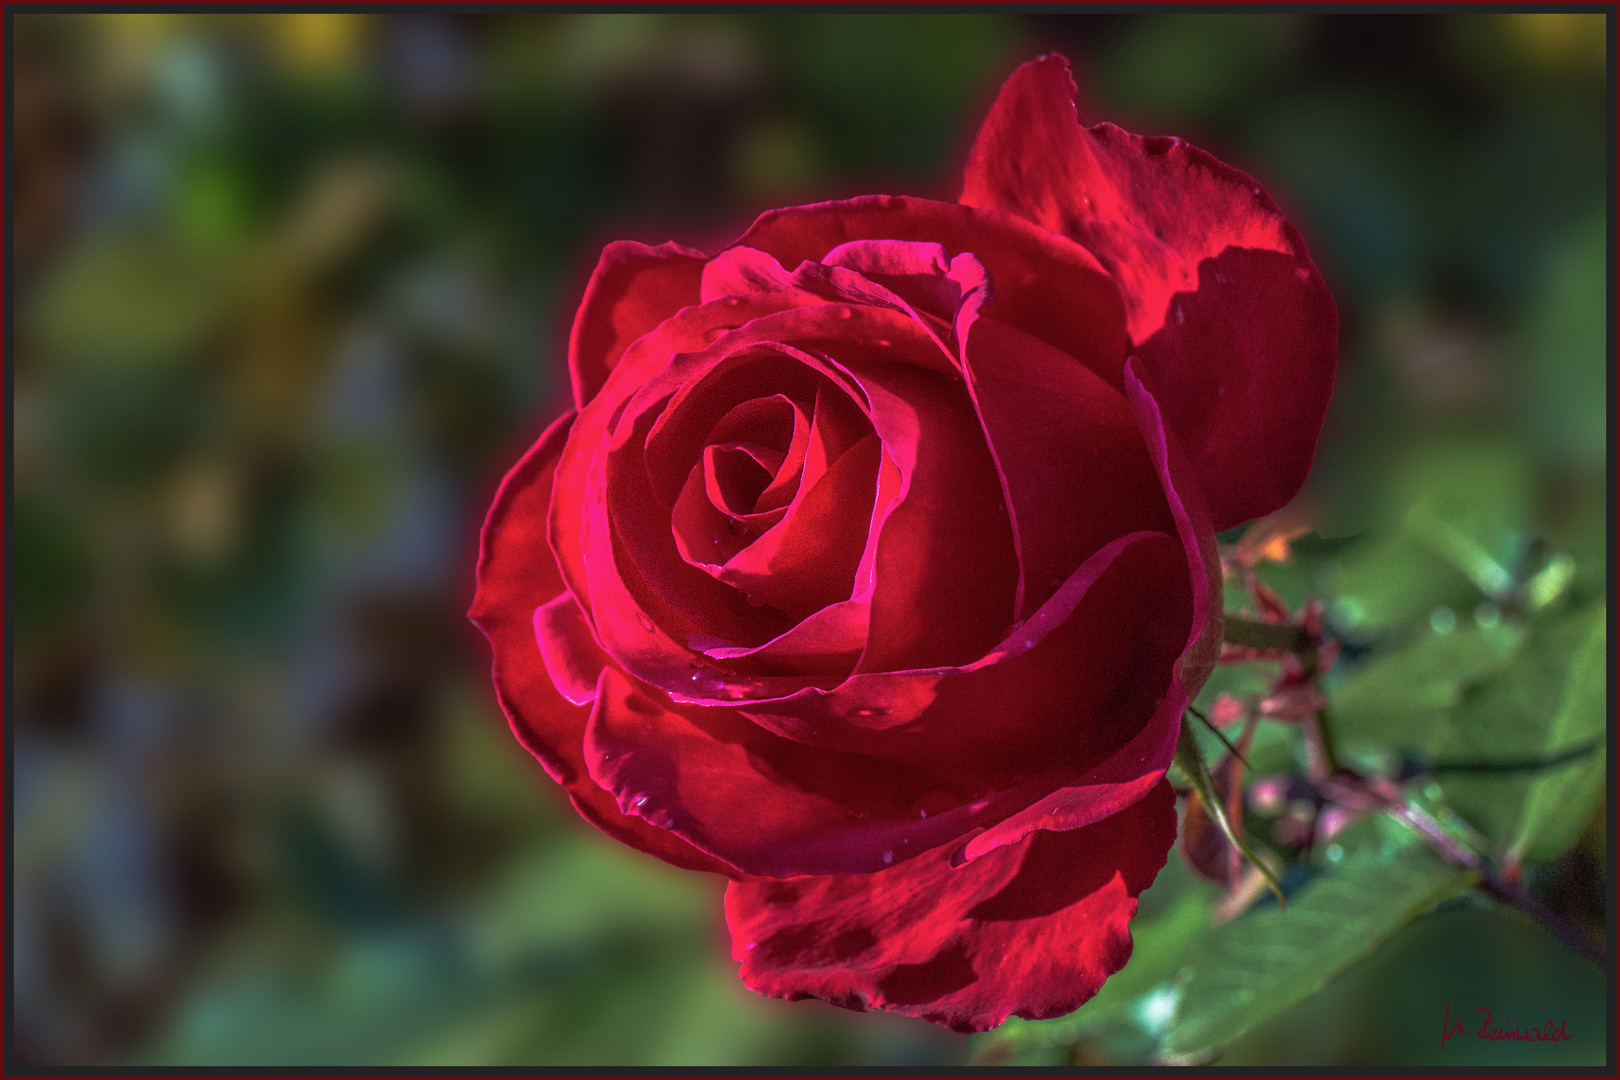 Unsere endgültig letzte Rose